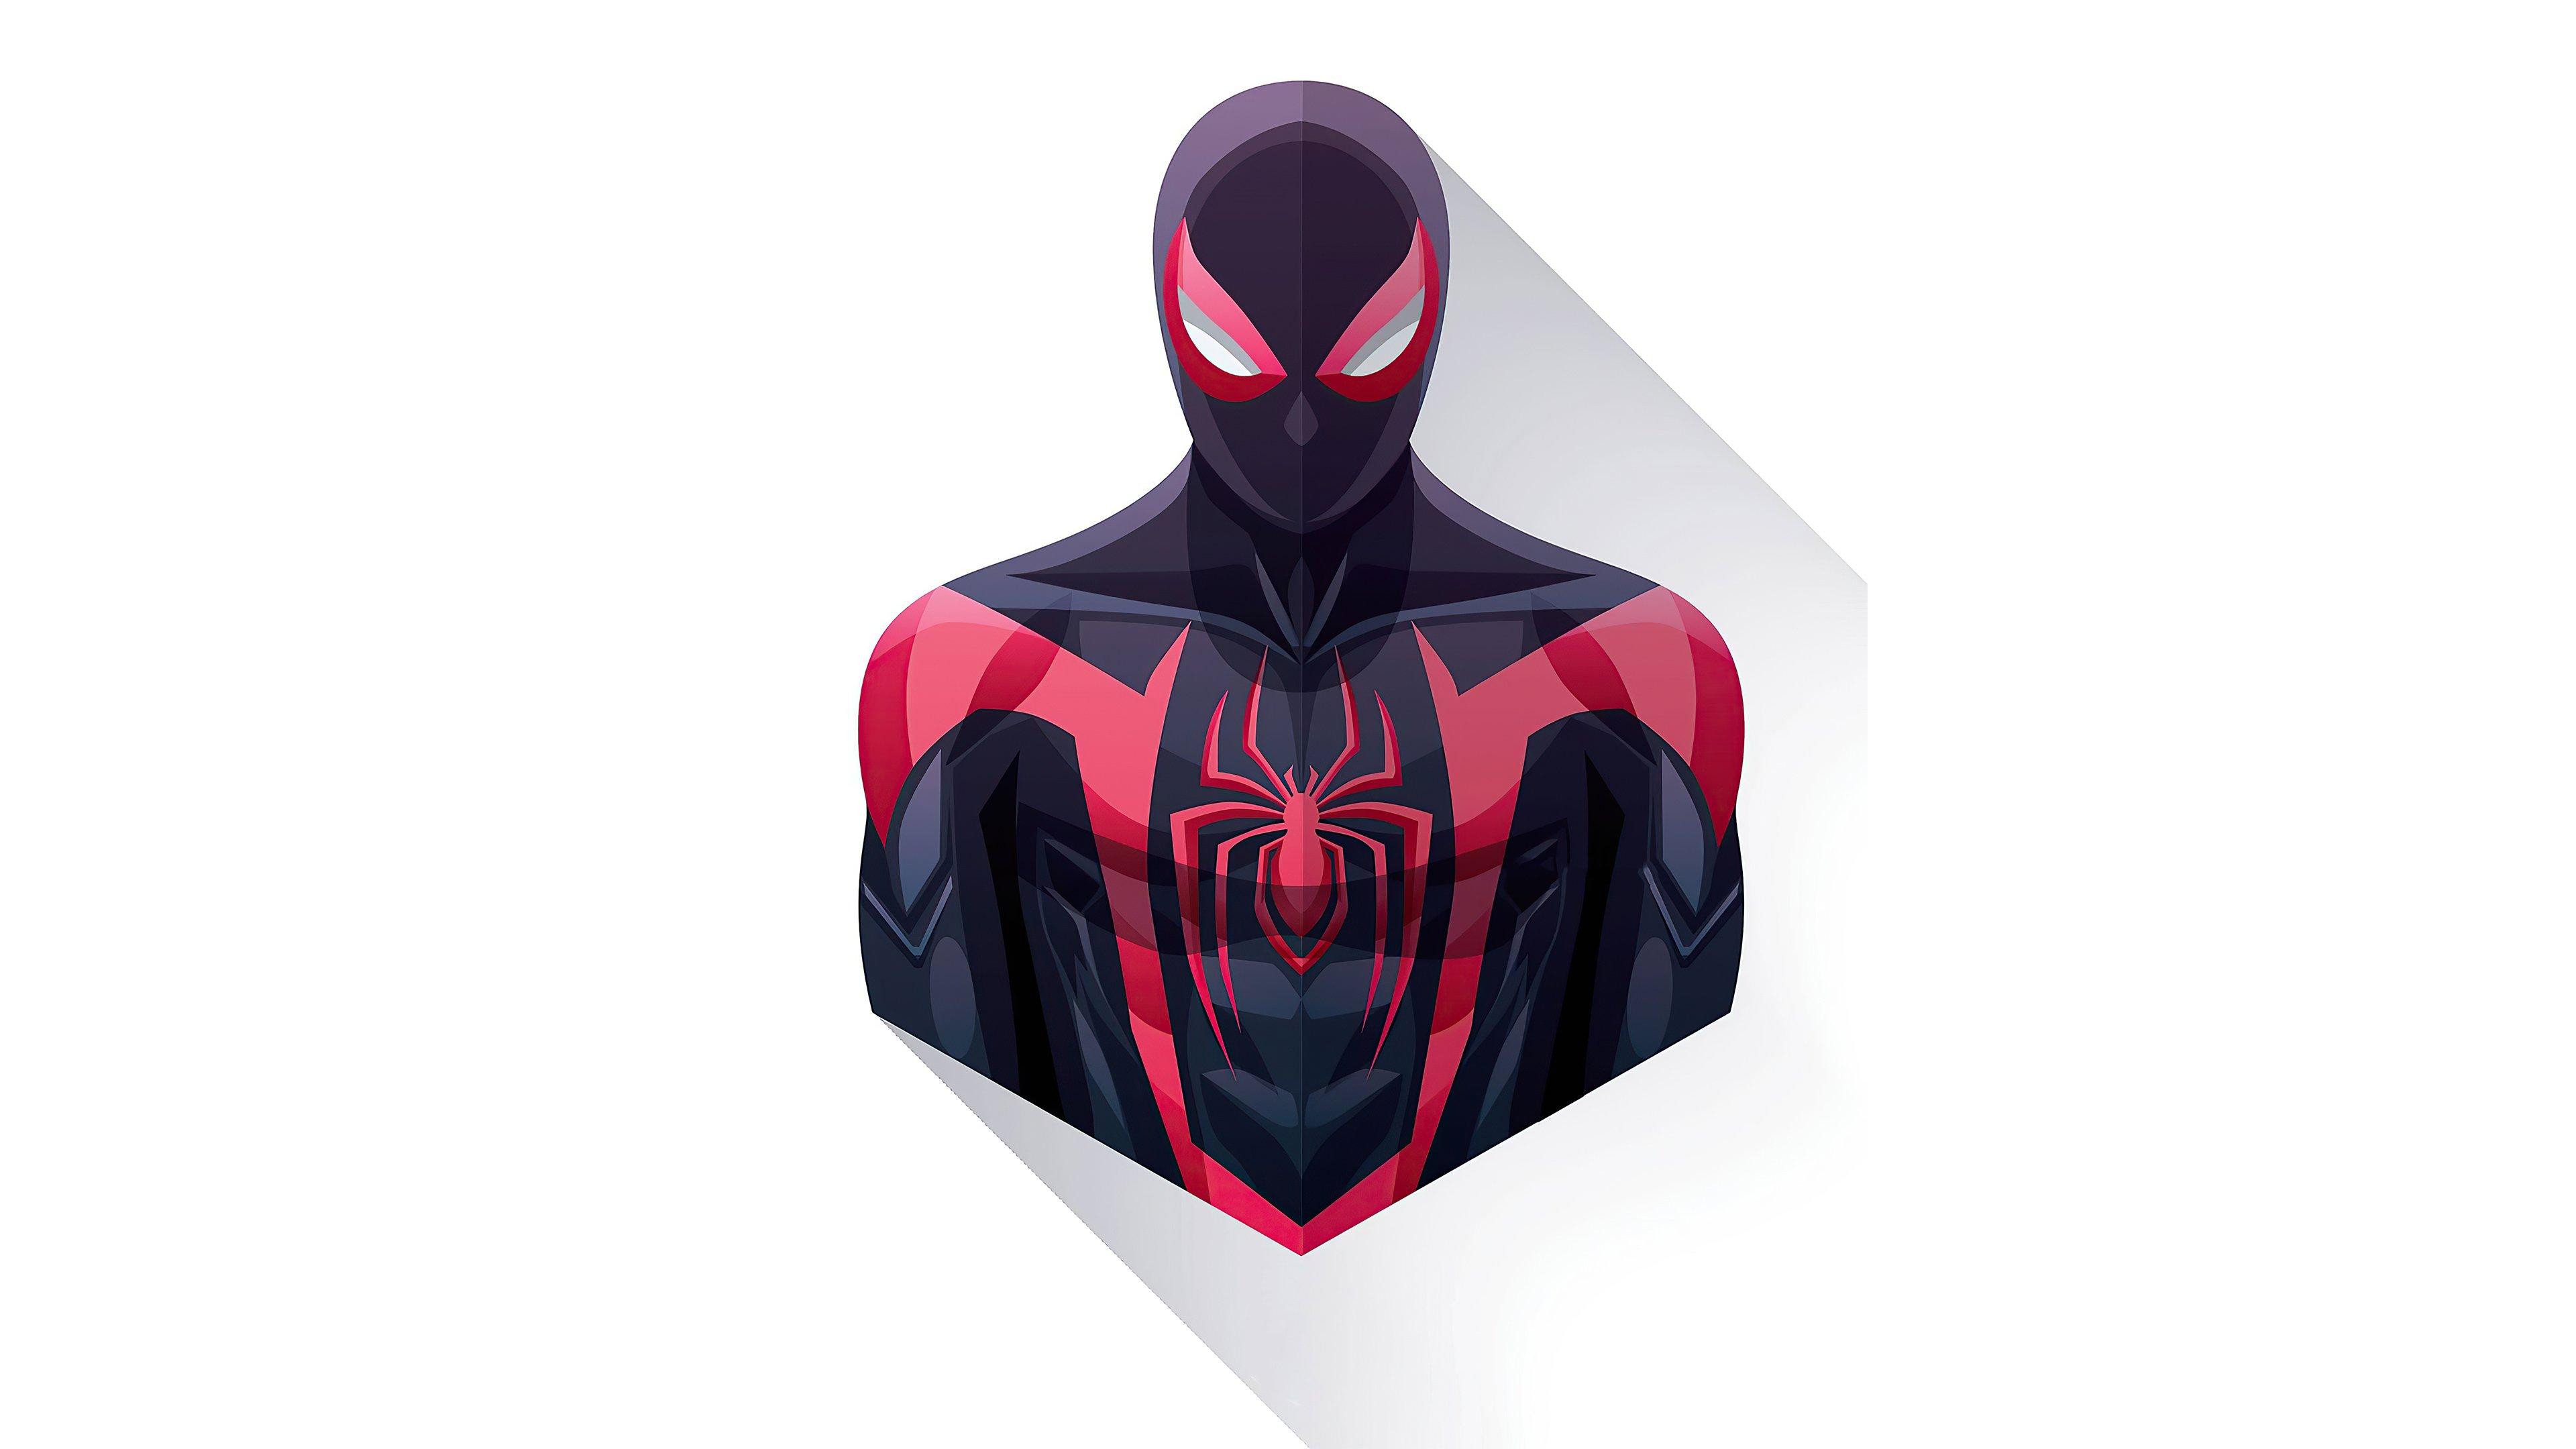 Wallpaper Black Spiderman Minimalist style